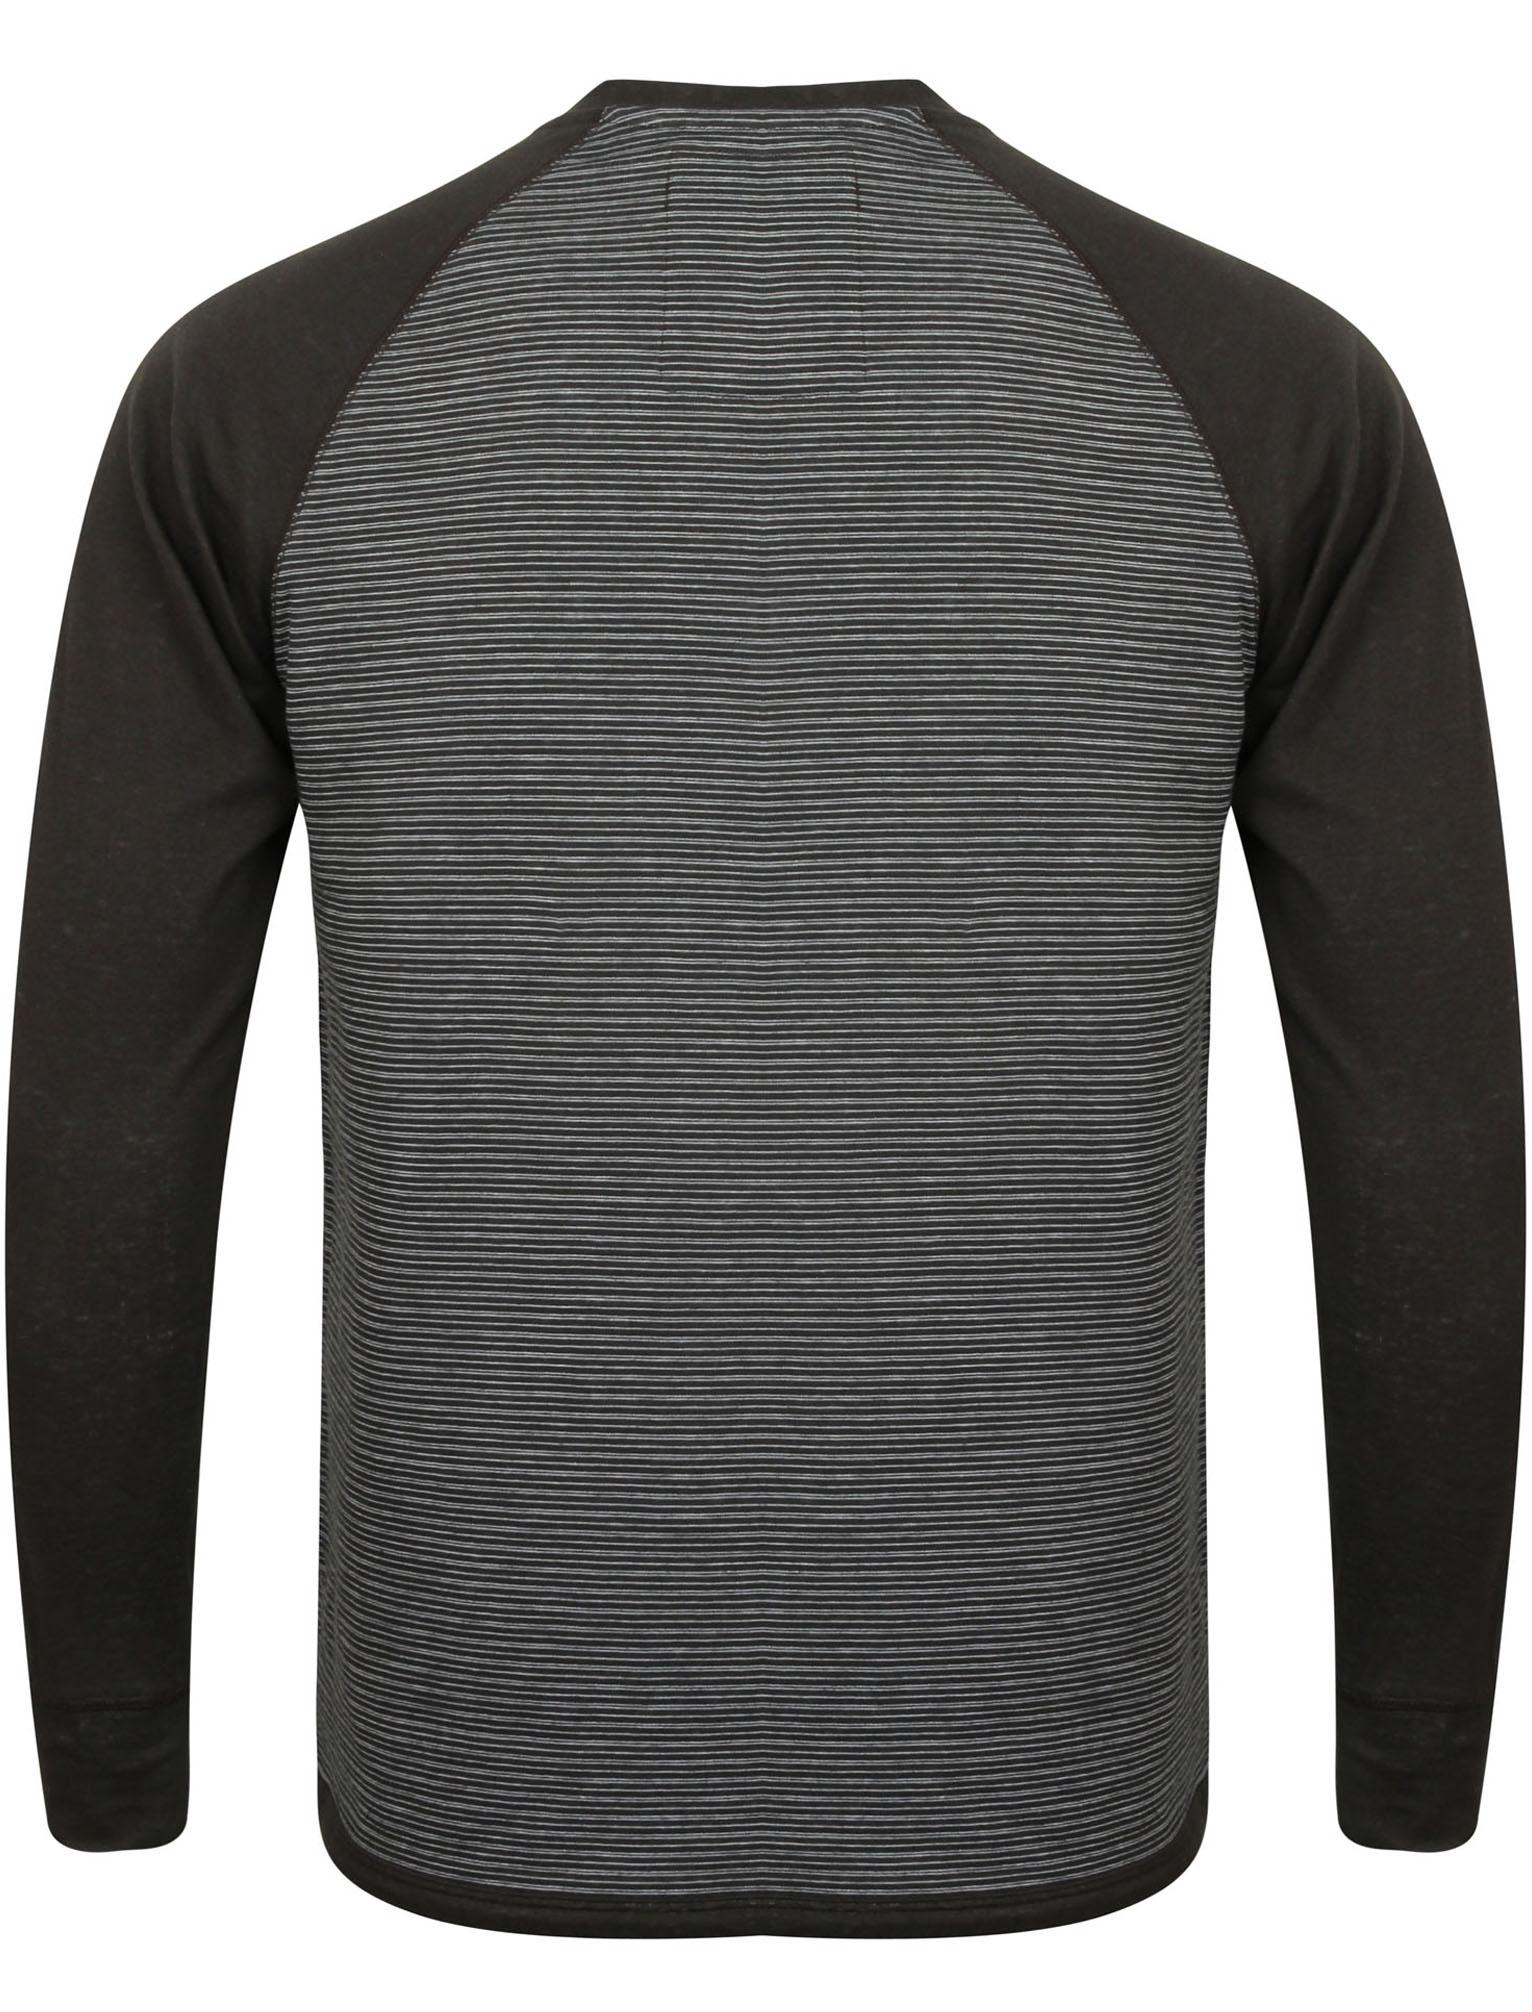 New-Mens-Tokyo-Laundry-Sephro-Raglan-Long-Sleeve-Henley-T-shirt-Top-Size-S-XL thumbnail 5